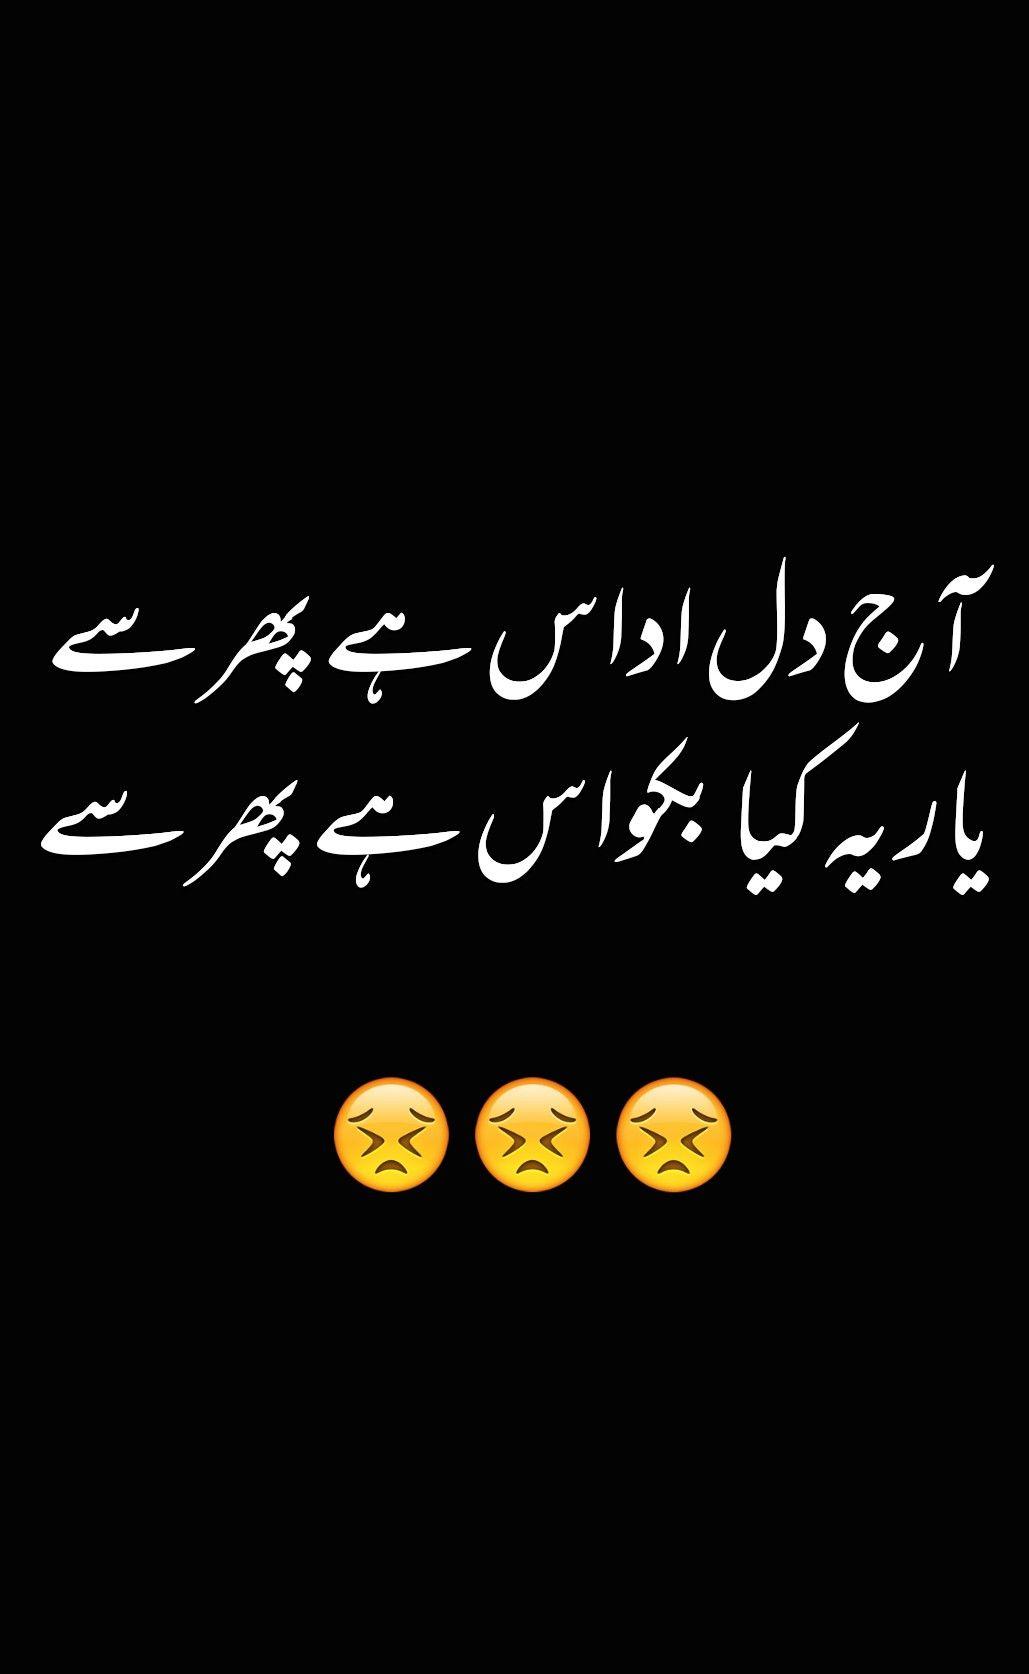 Arzukhan Urdu Funny Quotes Jokes Quotes Funny Quotes In Urdu